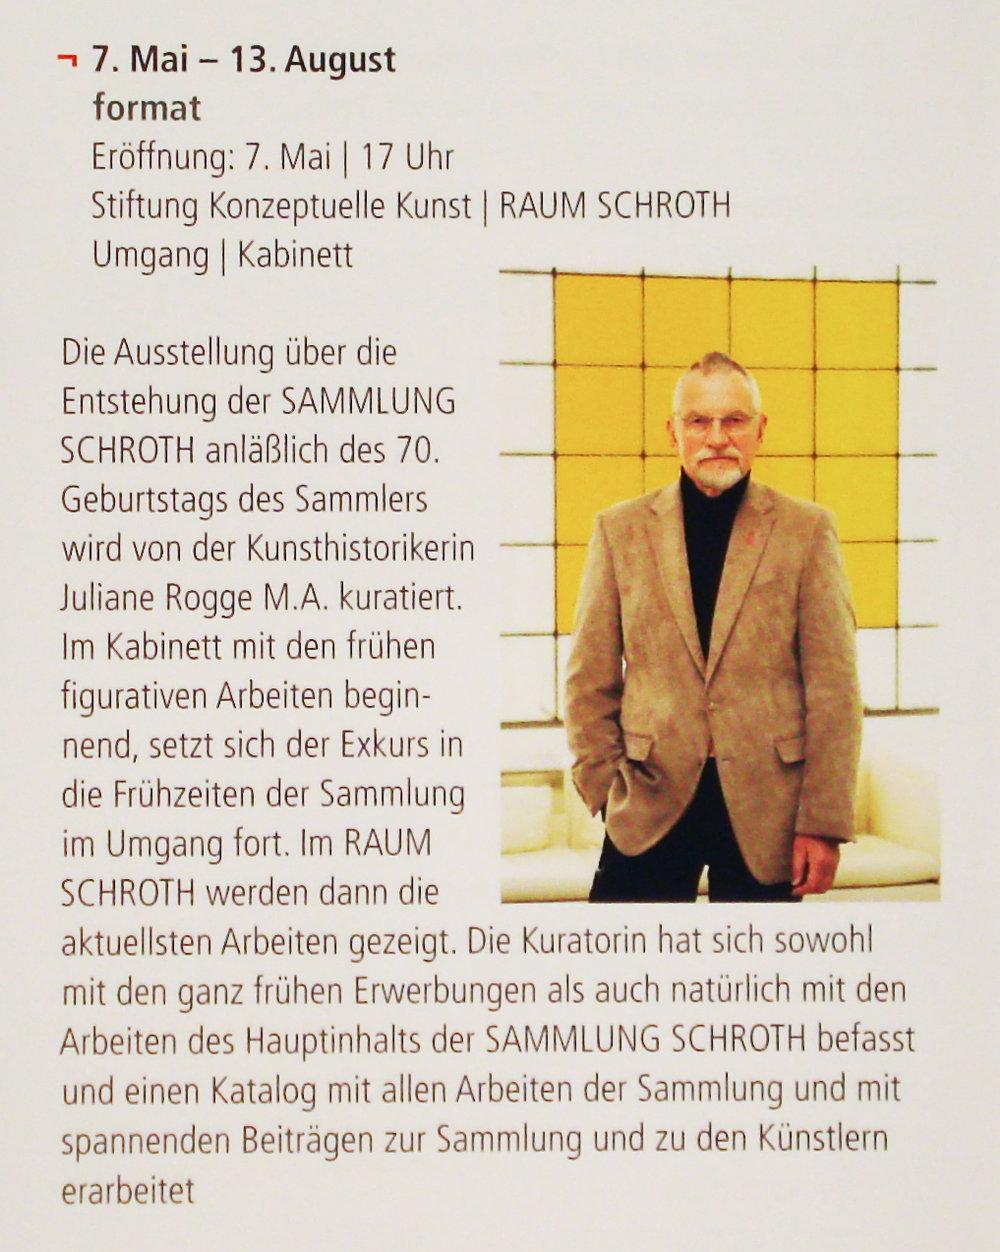 2017.05.07_Museum Wilhelm Morgner [Raum Schrott]_Format_Soest_1.jpg